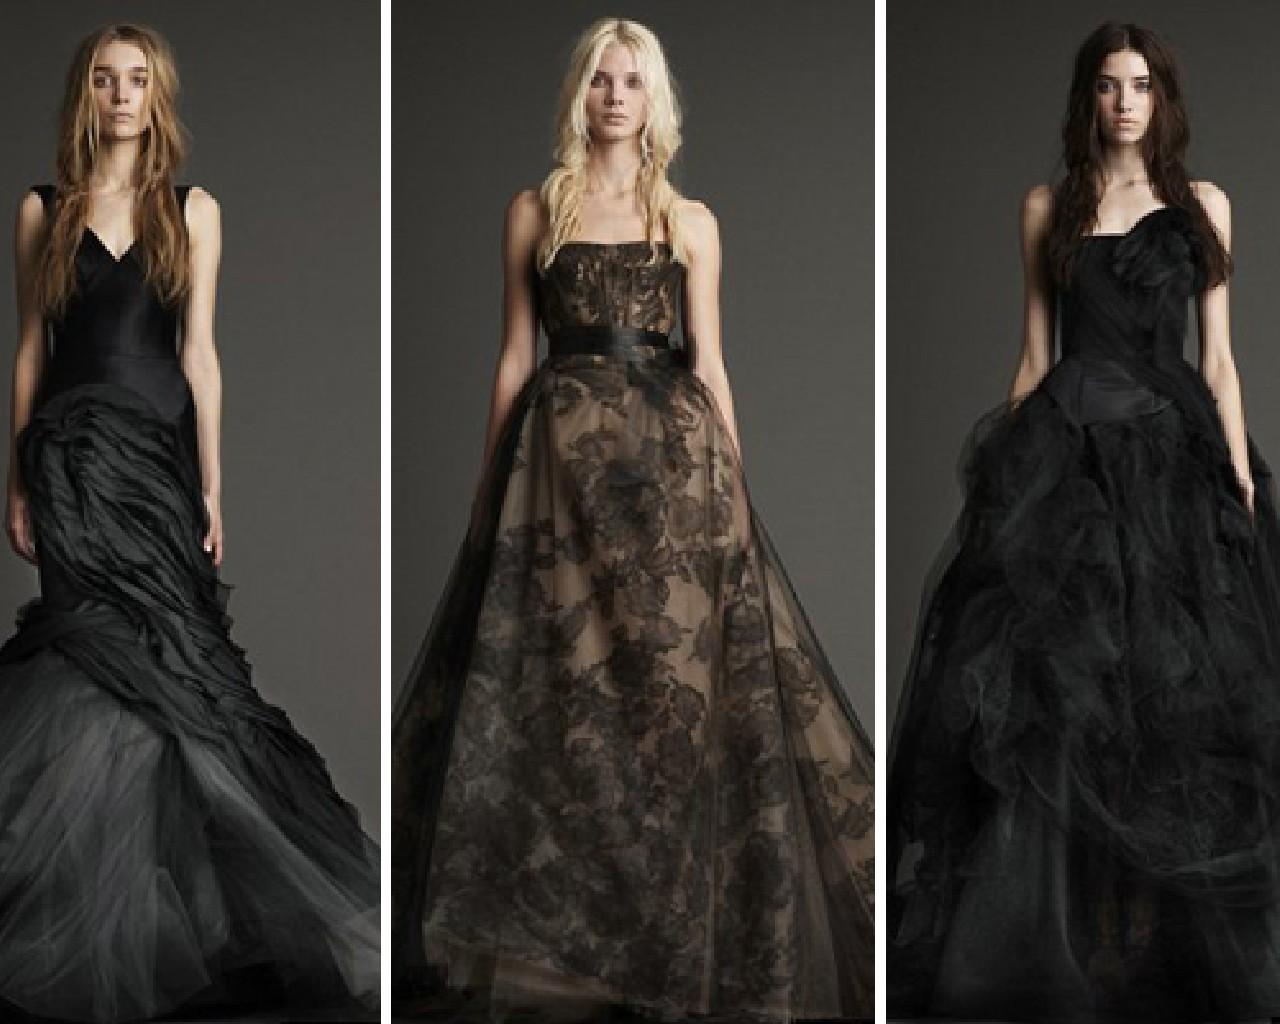 Black Wedding Dresses! Yes Or No!?